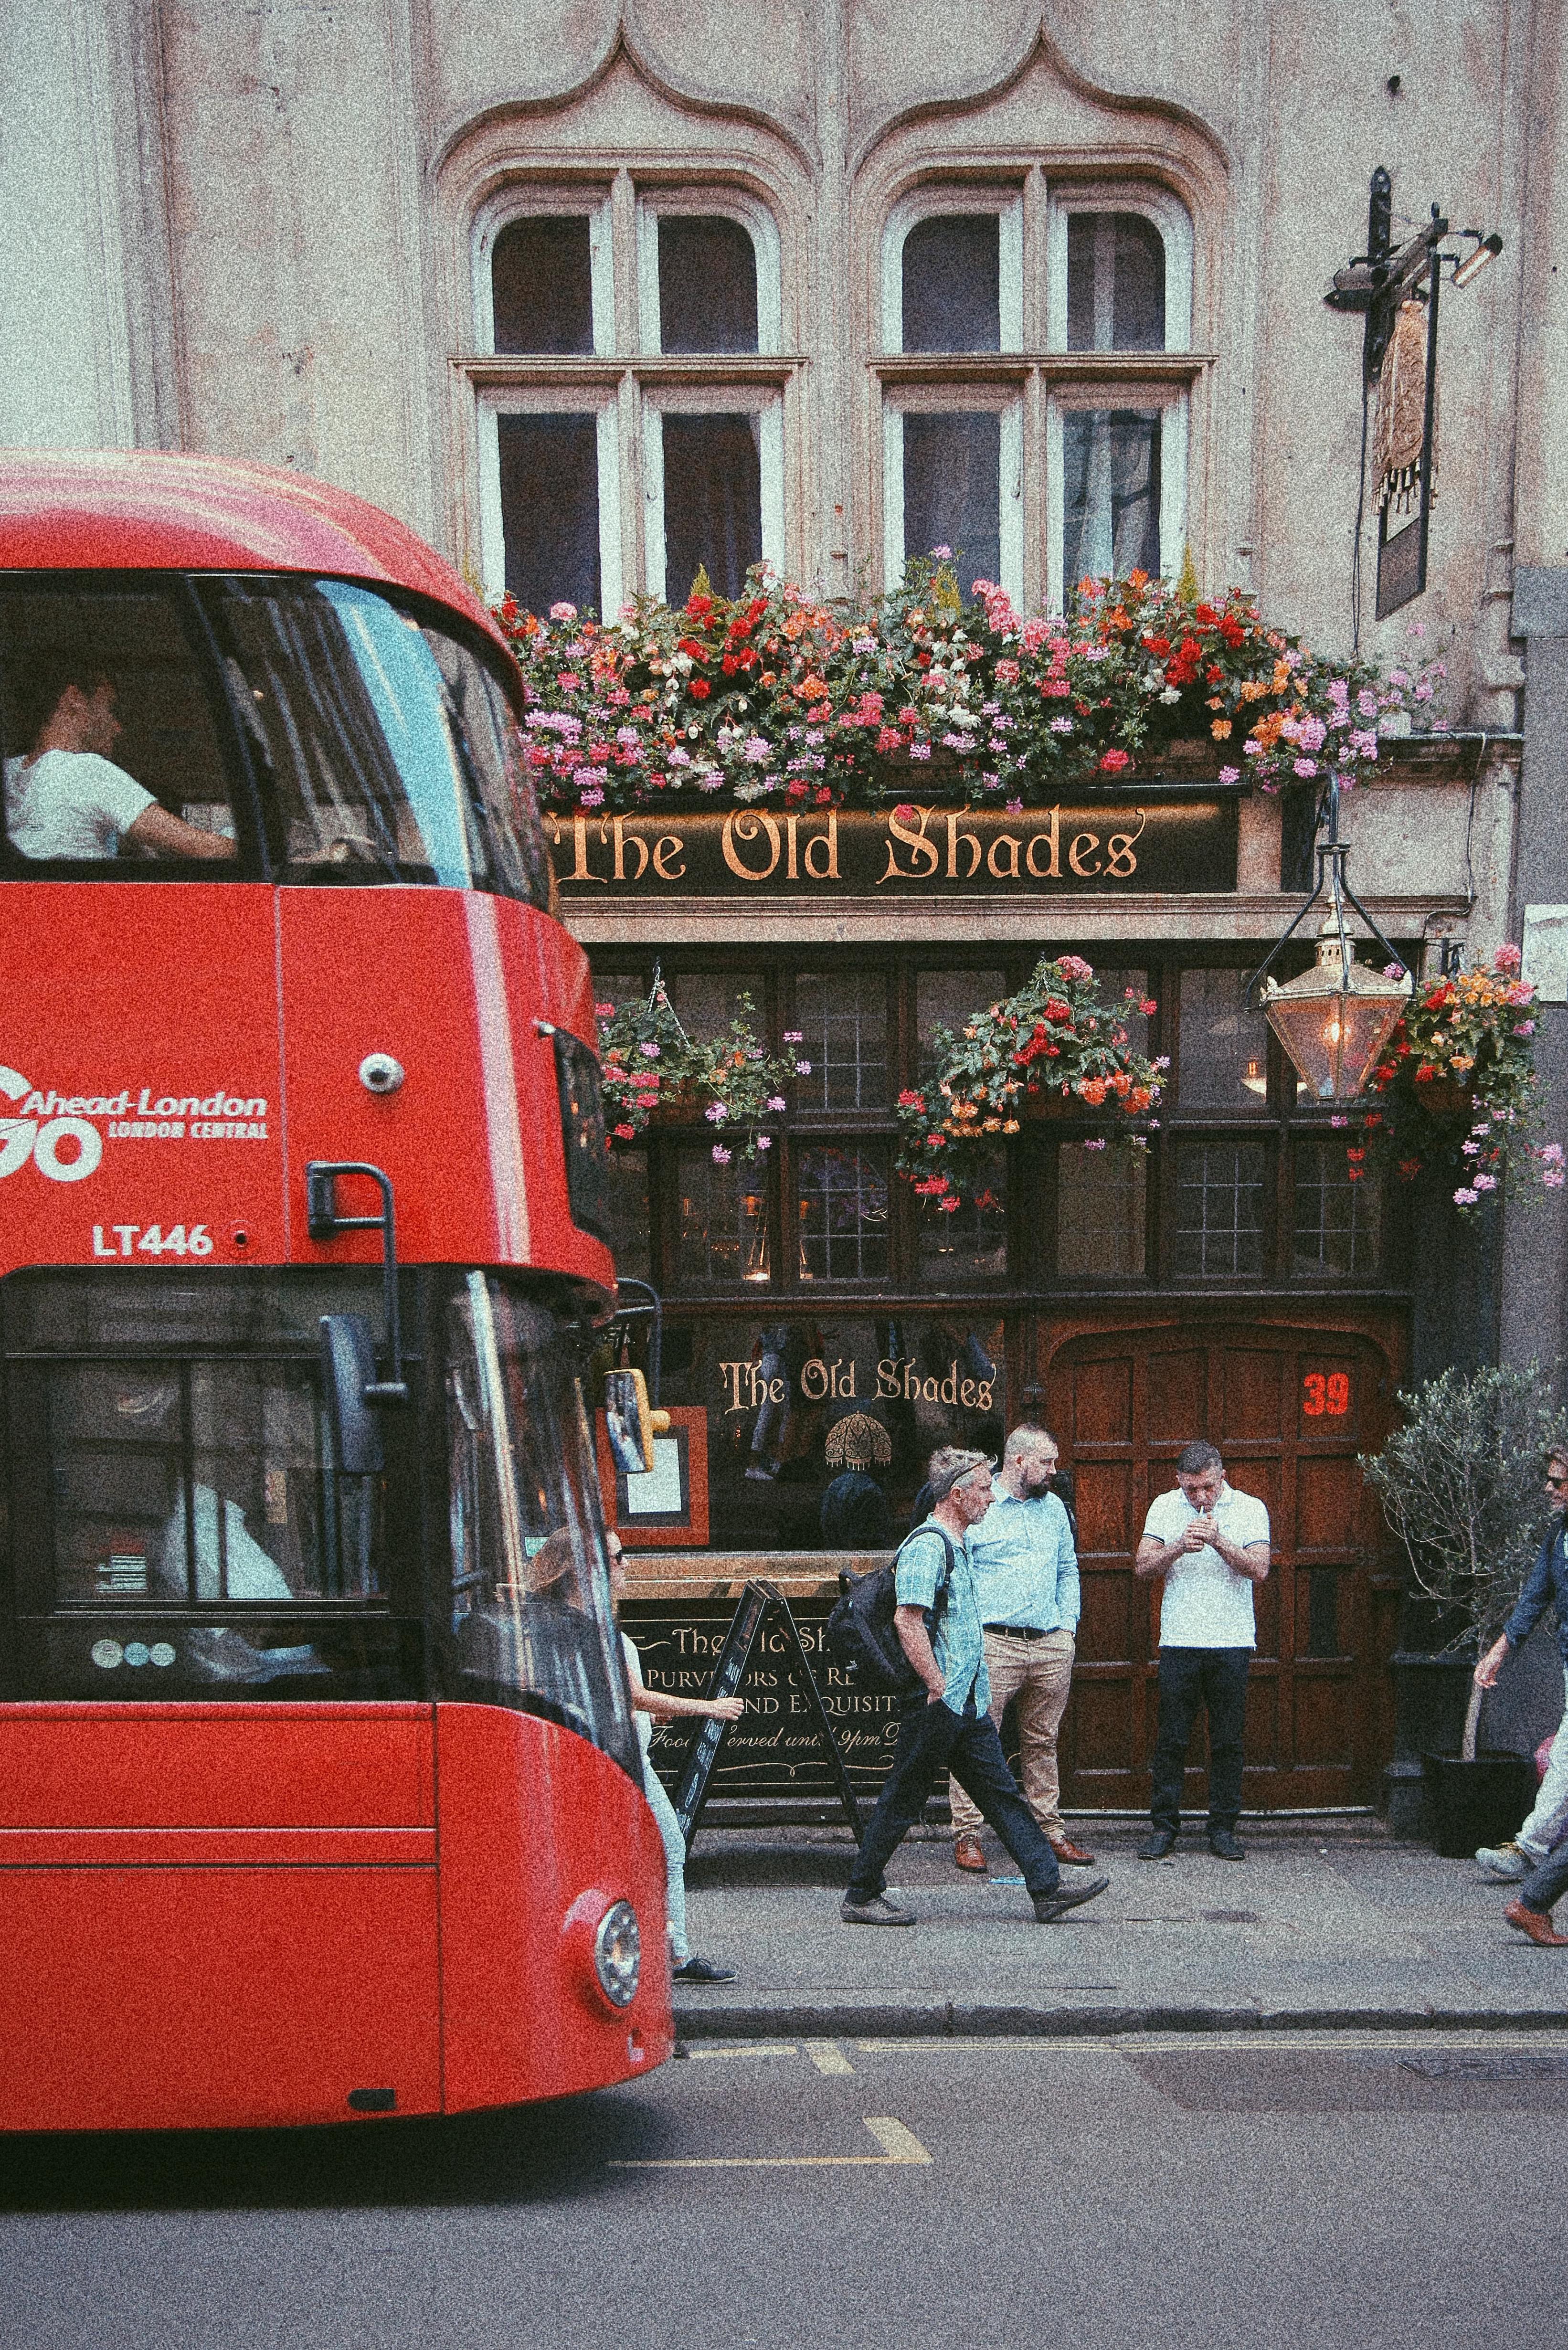 Londra, the old shades pub